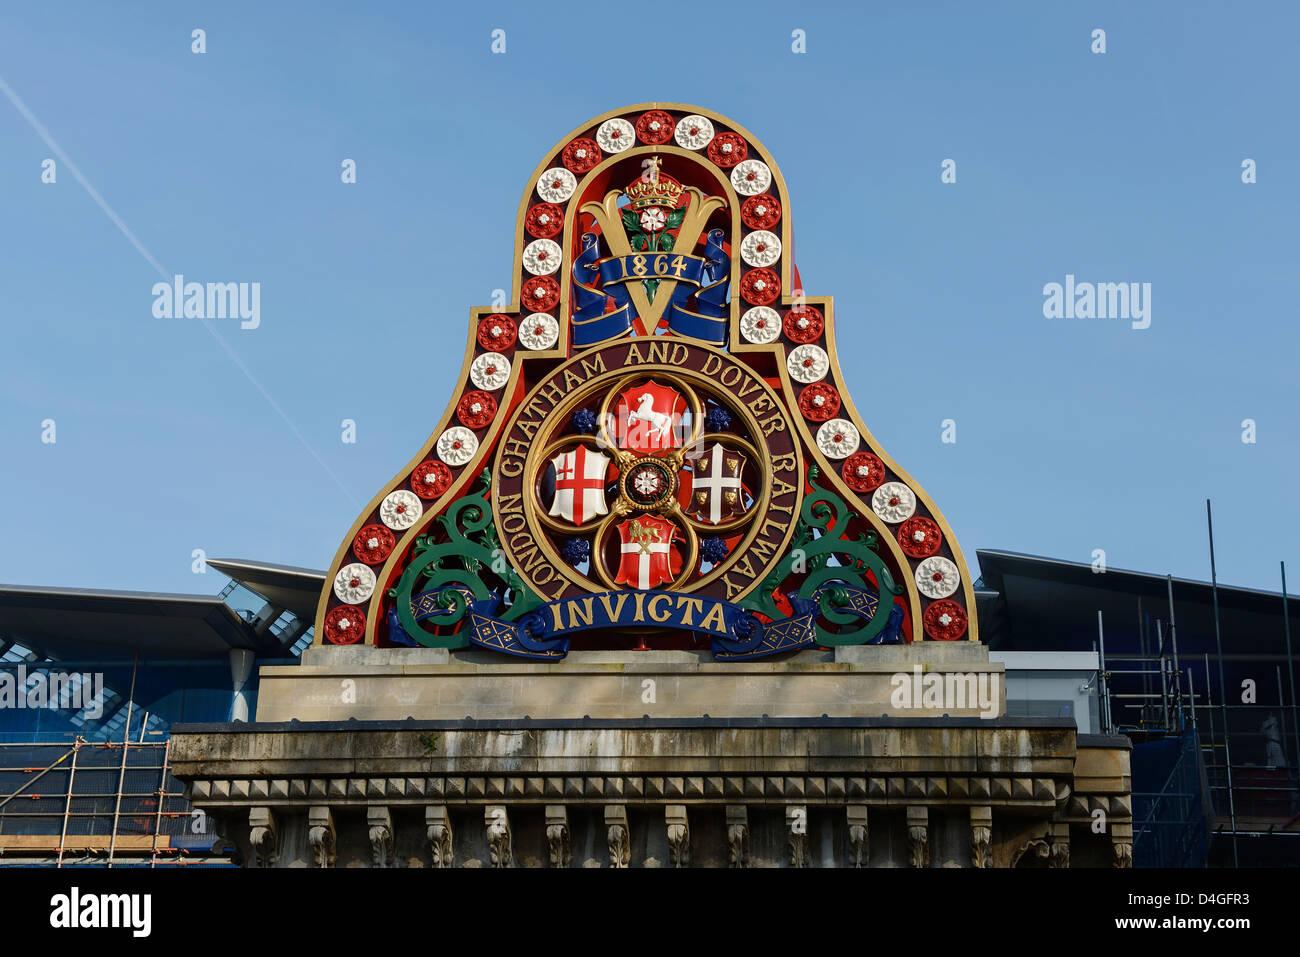 Architectural detail on Blackfriars railway bridge London UK - Stock Image